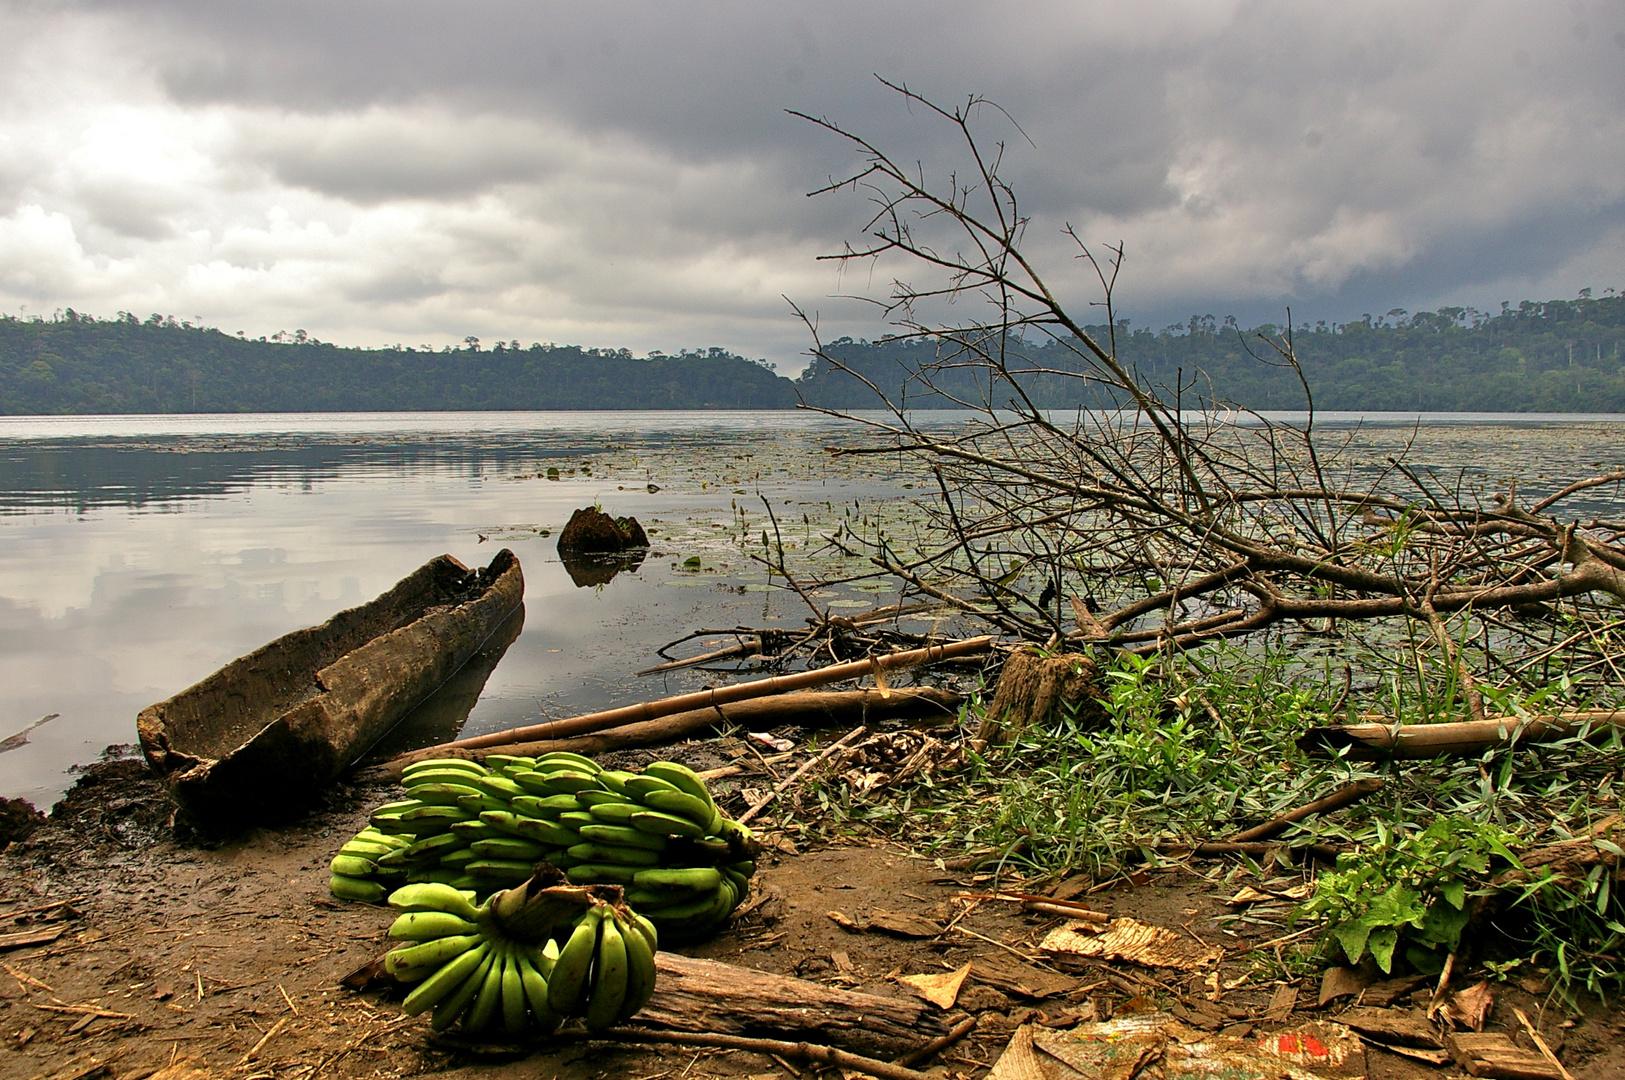 Lago Barombi Mbo